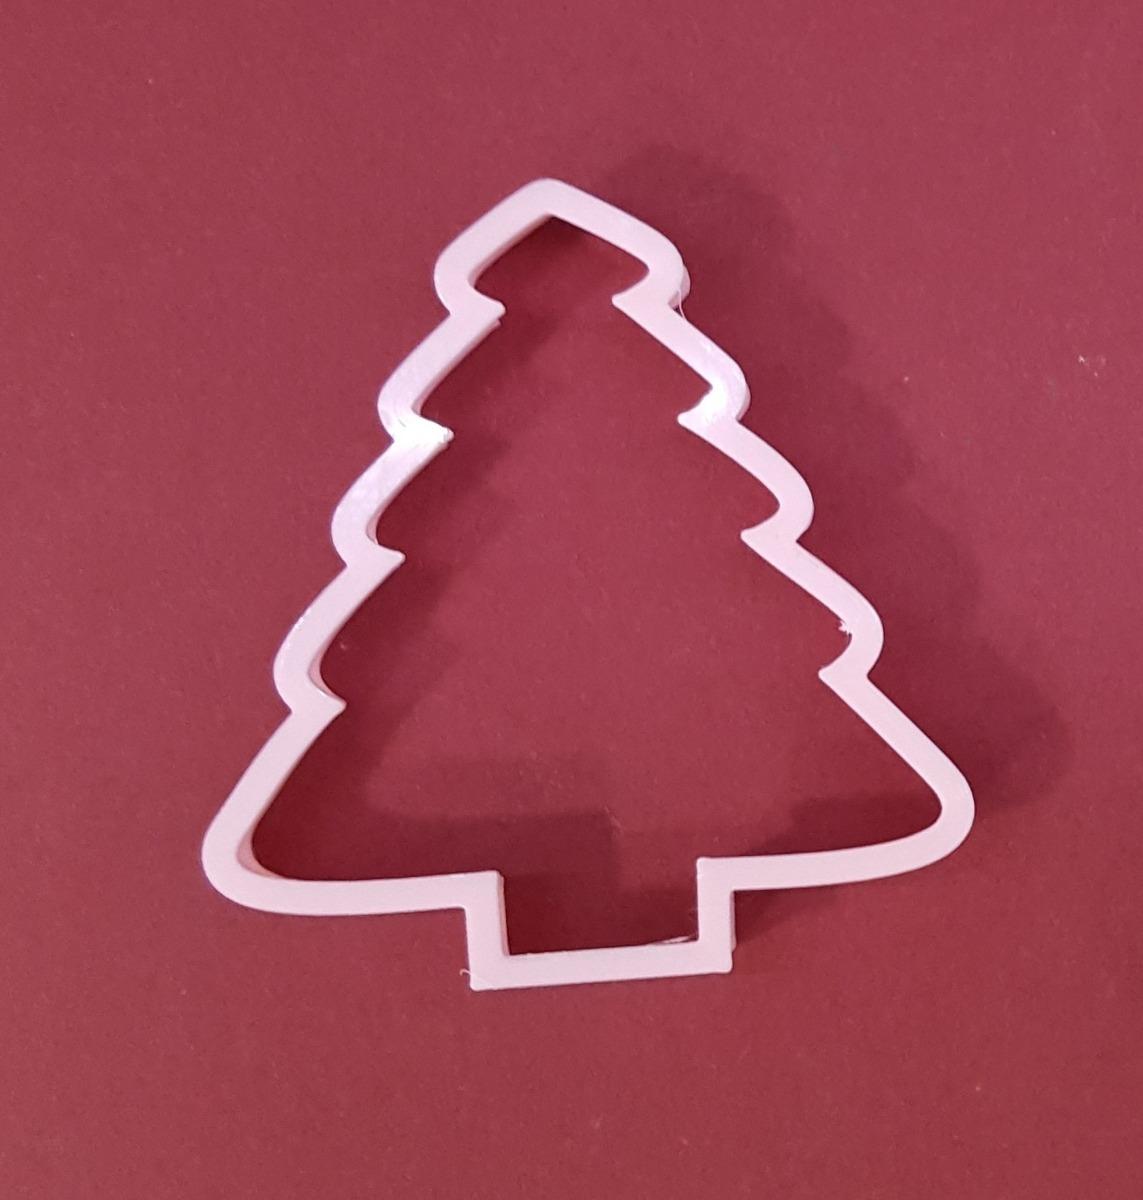 e2ace0161cc9d Cortante Repostería Set Navidad (x 3 Unid) -   200